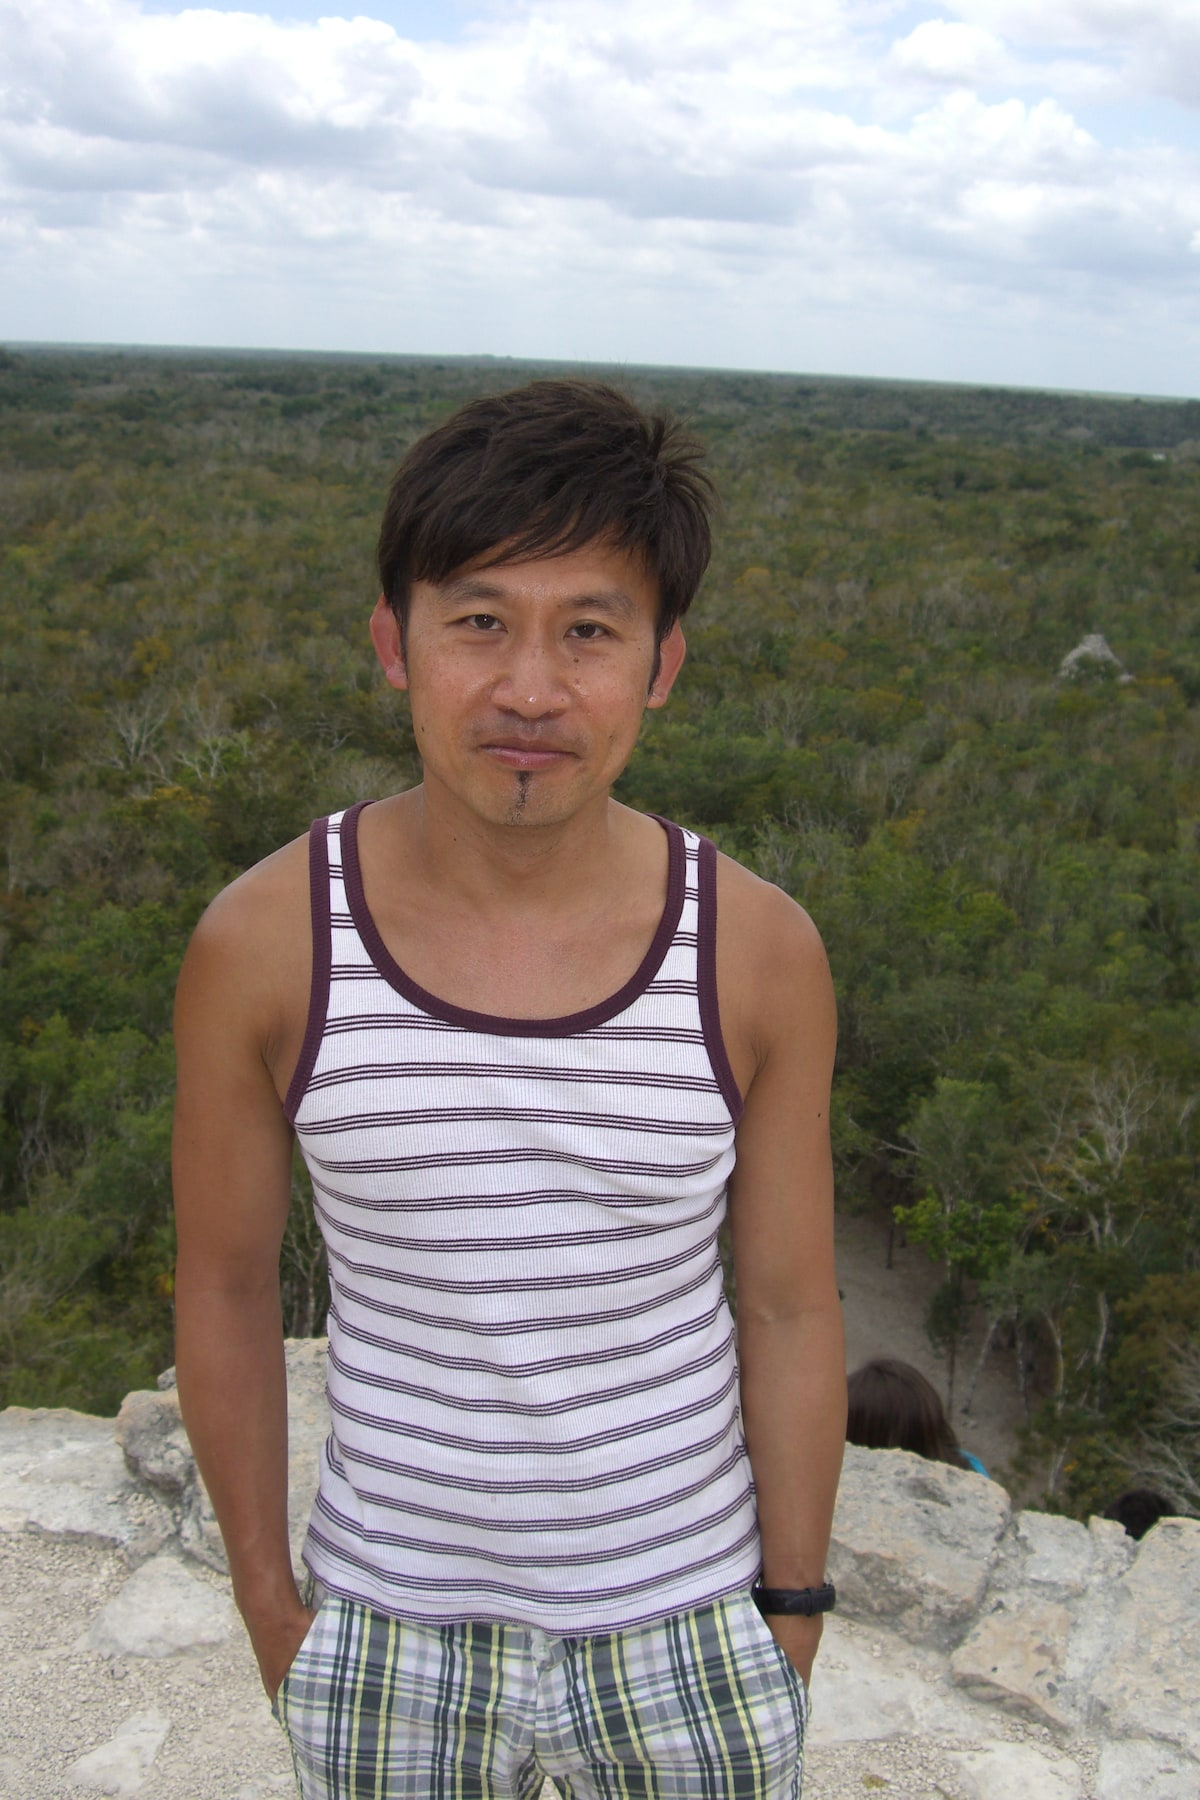 Hung Kwan Eric from London